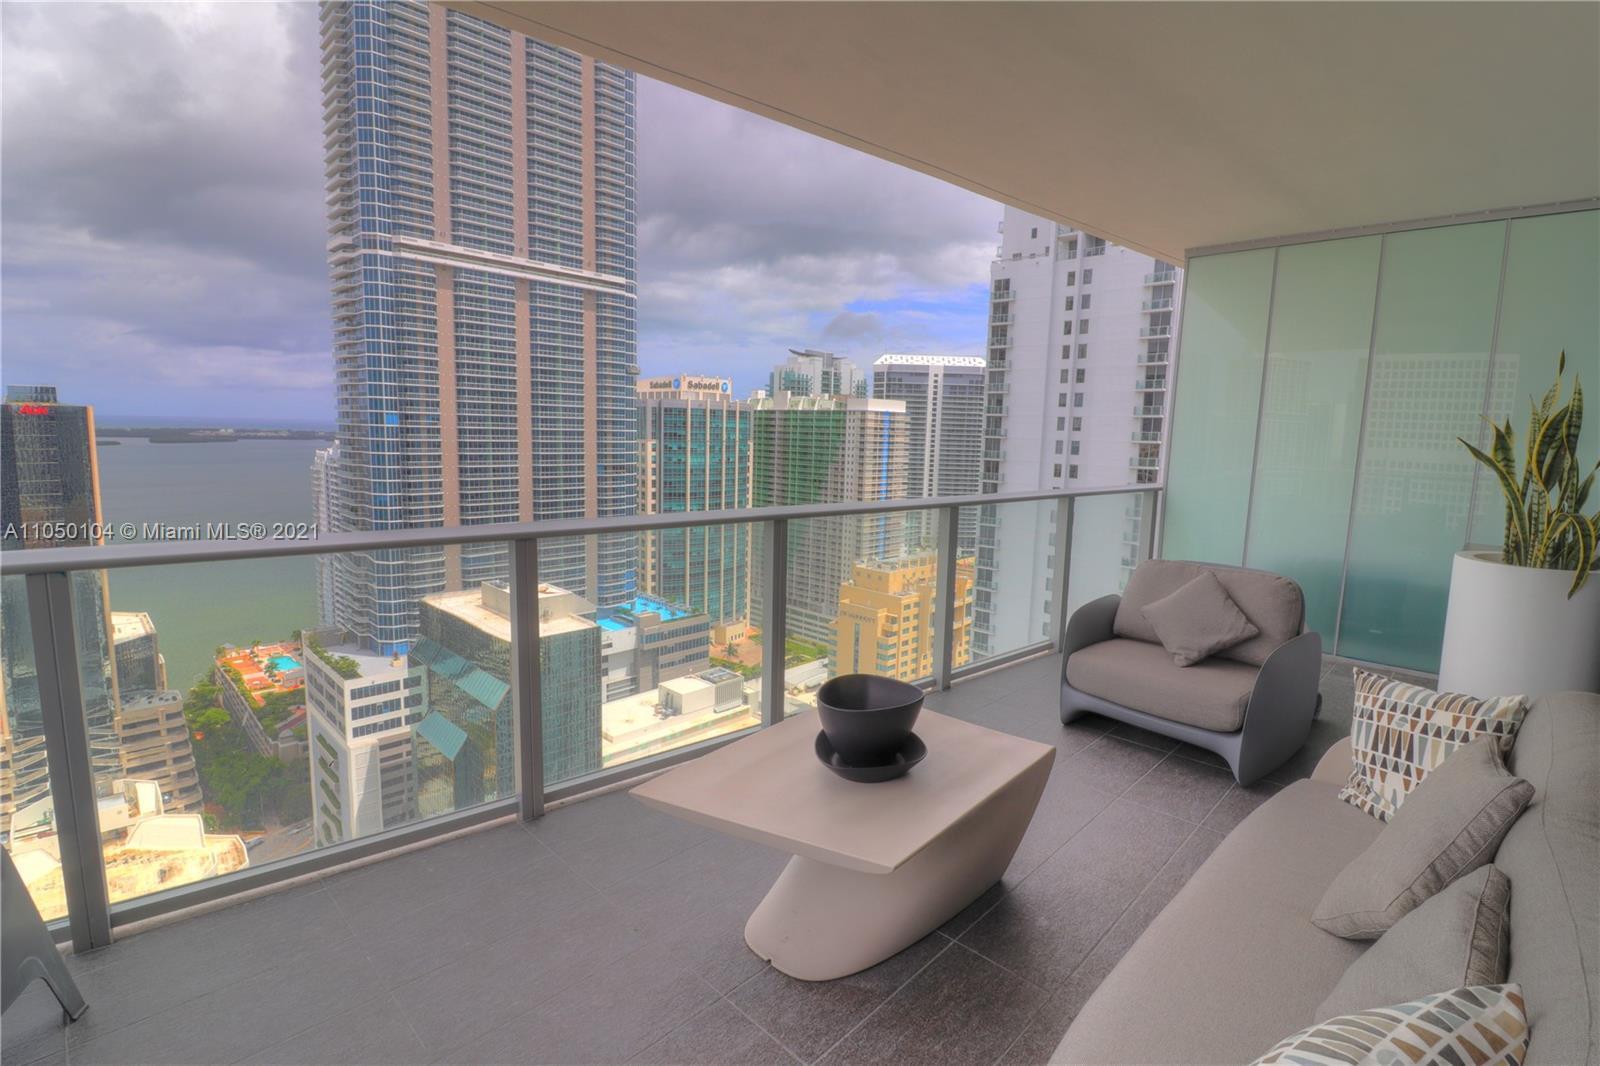 1010 Brickell #3601 - 1010 Brickell Ave #3601, Miami, FL 33131